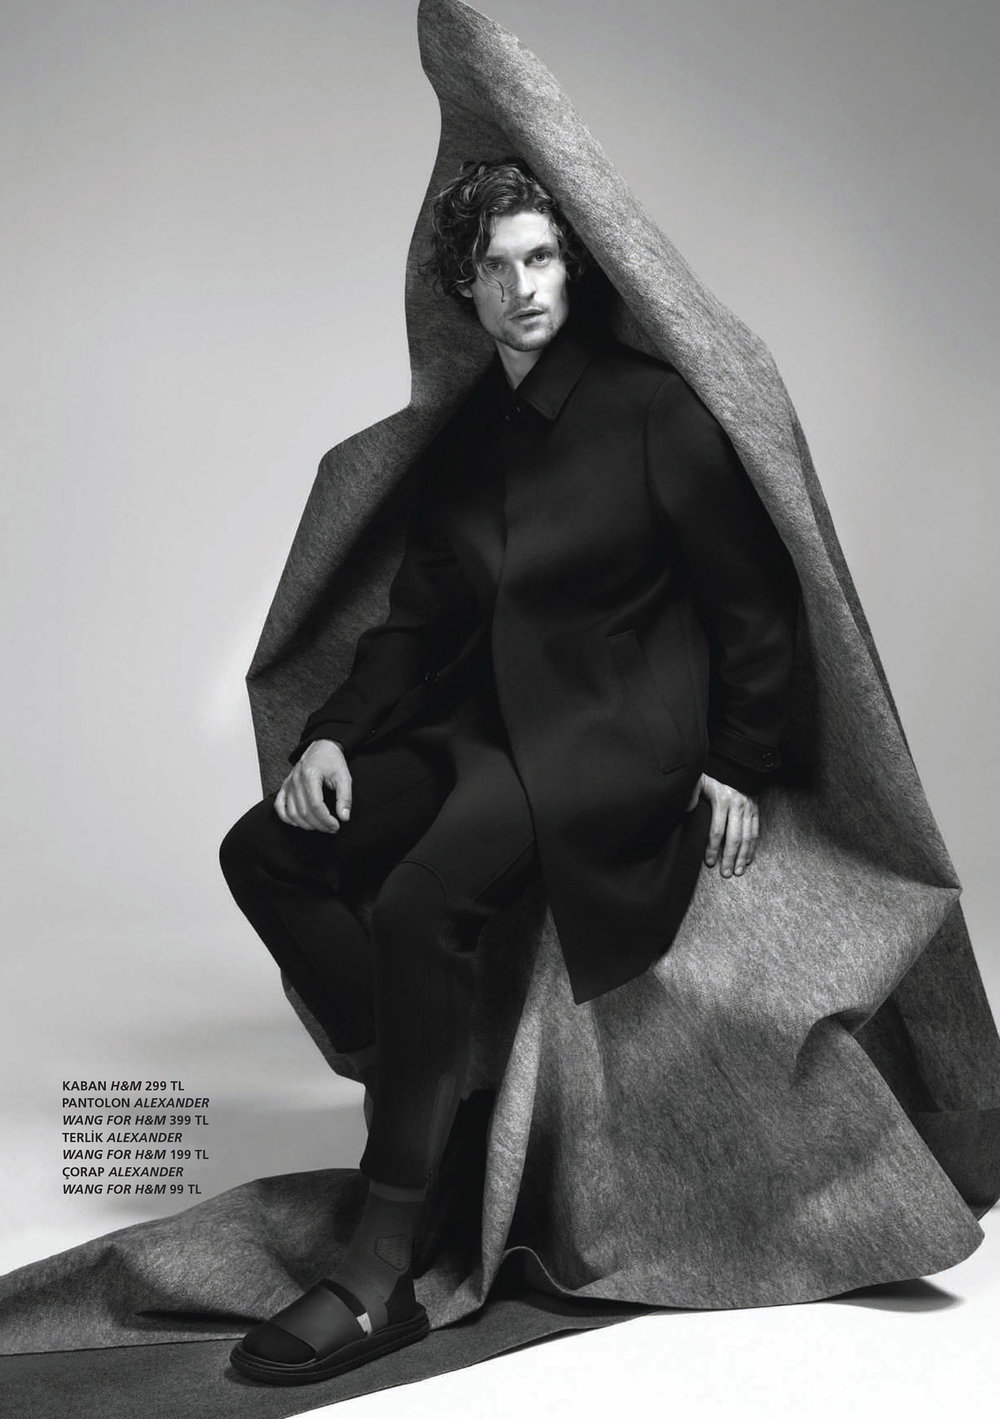 L'officiel HommesTurkey - 2014, November Issue